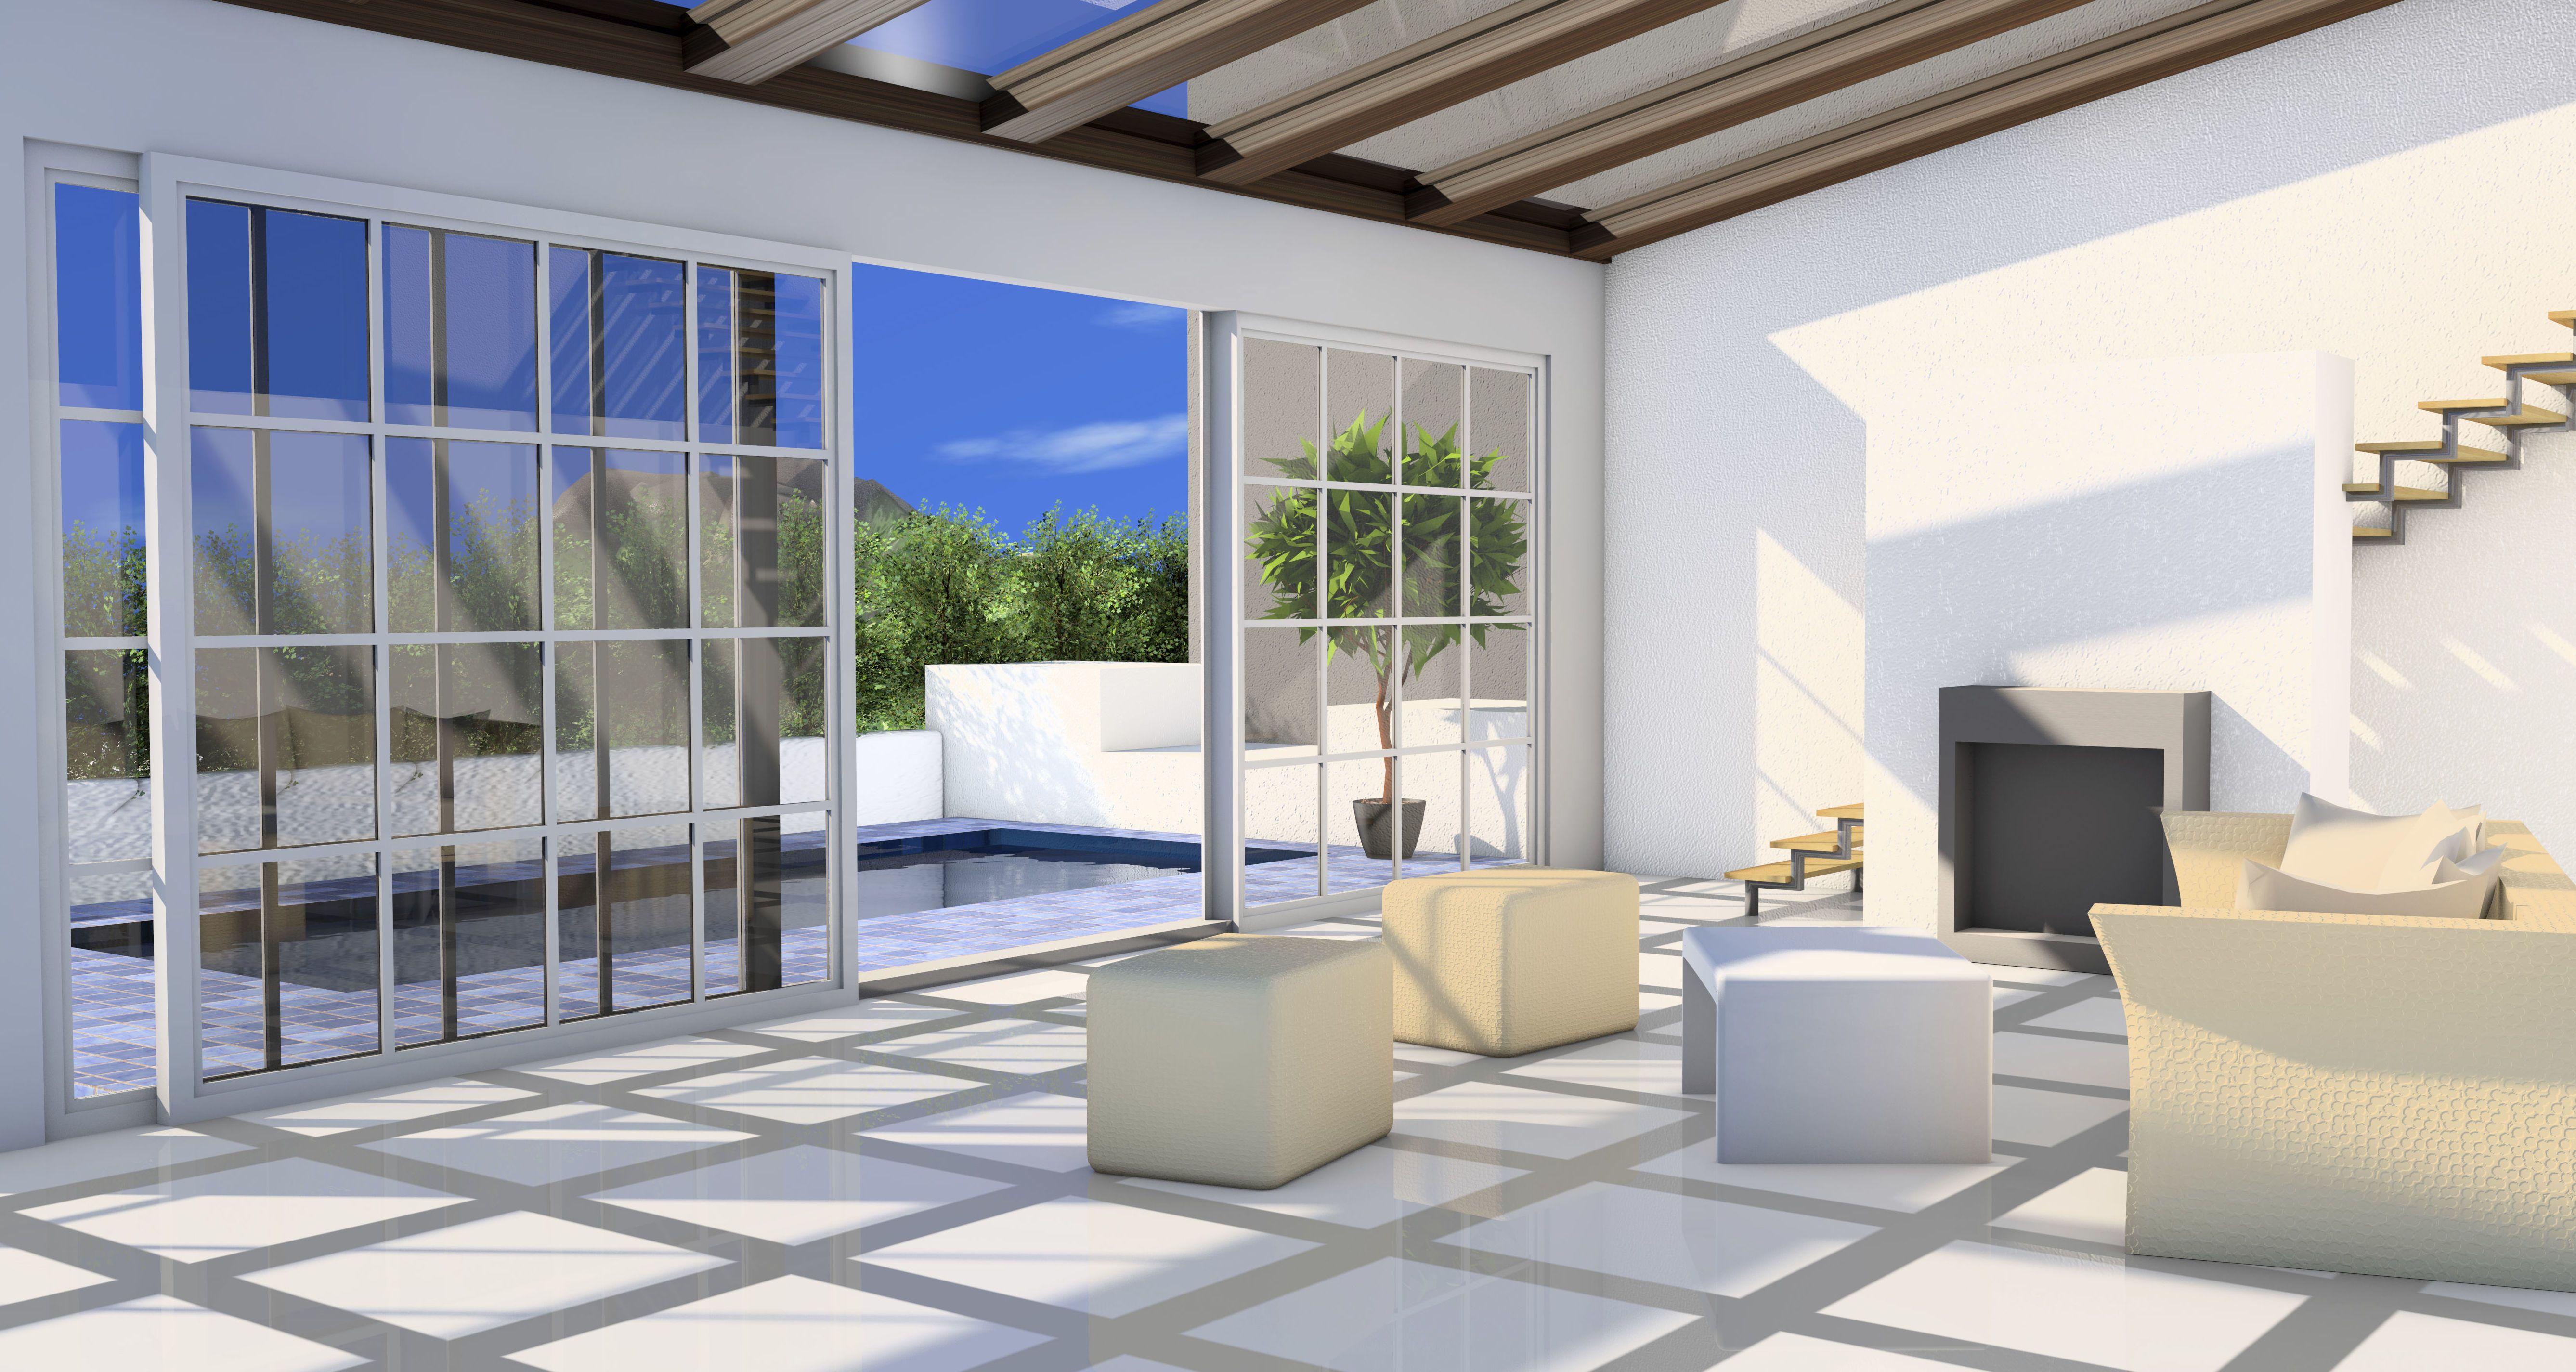 Precios de ventanas de pvc en gij n ventanas asturcon for Pvc o aluminio precios